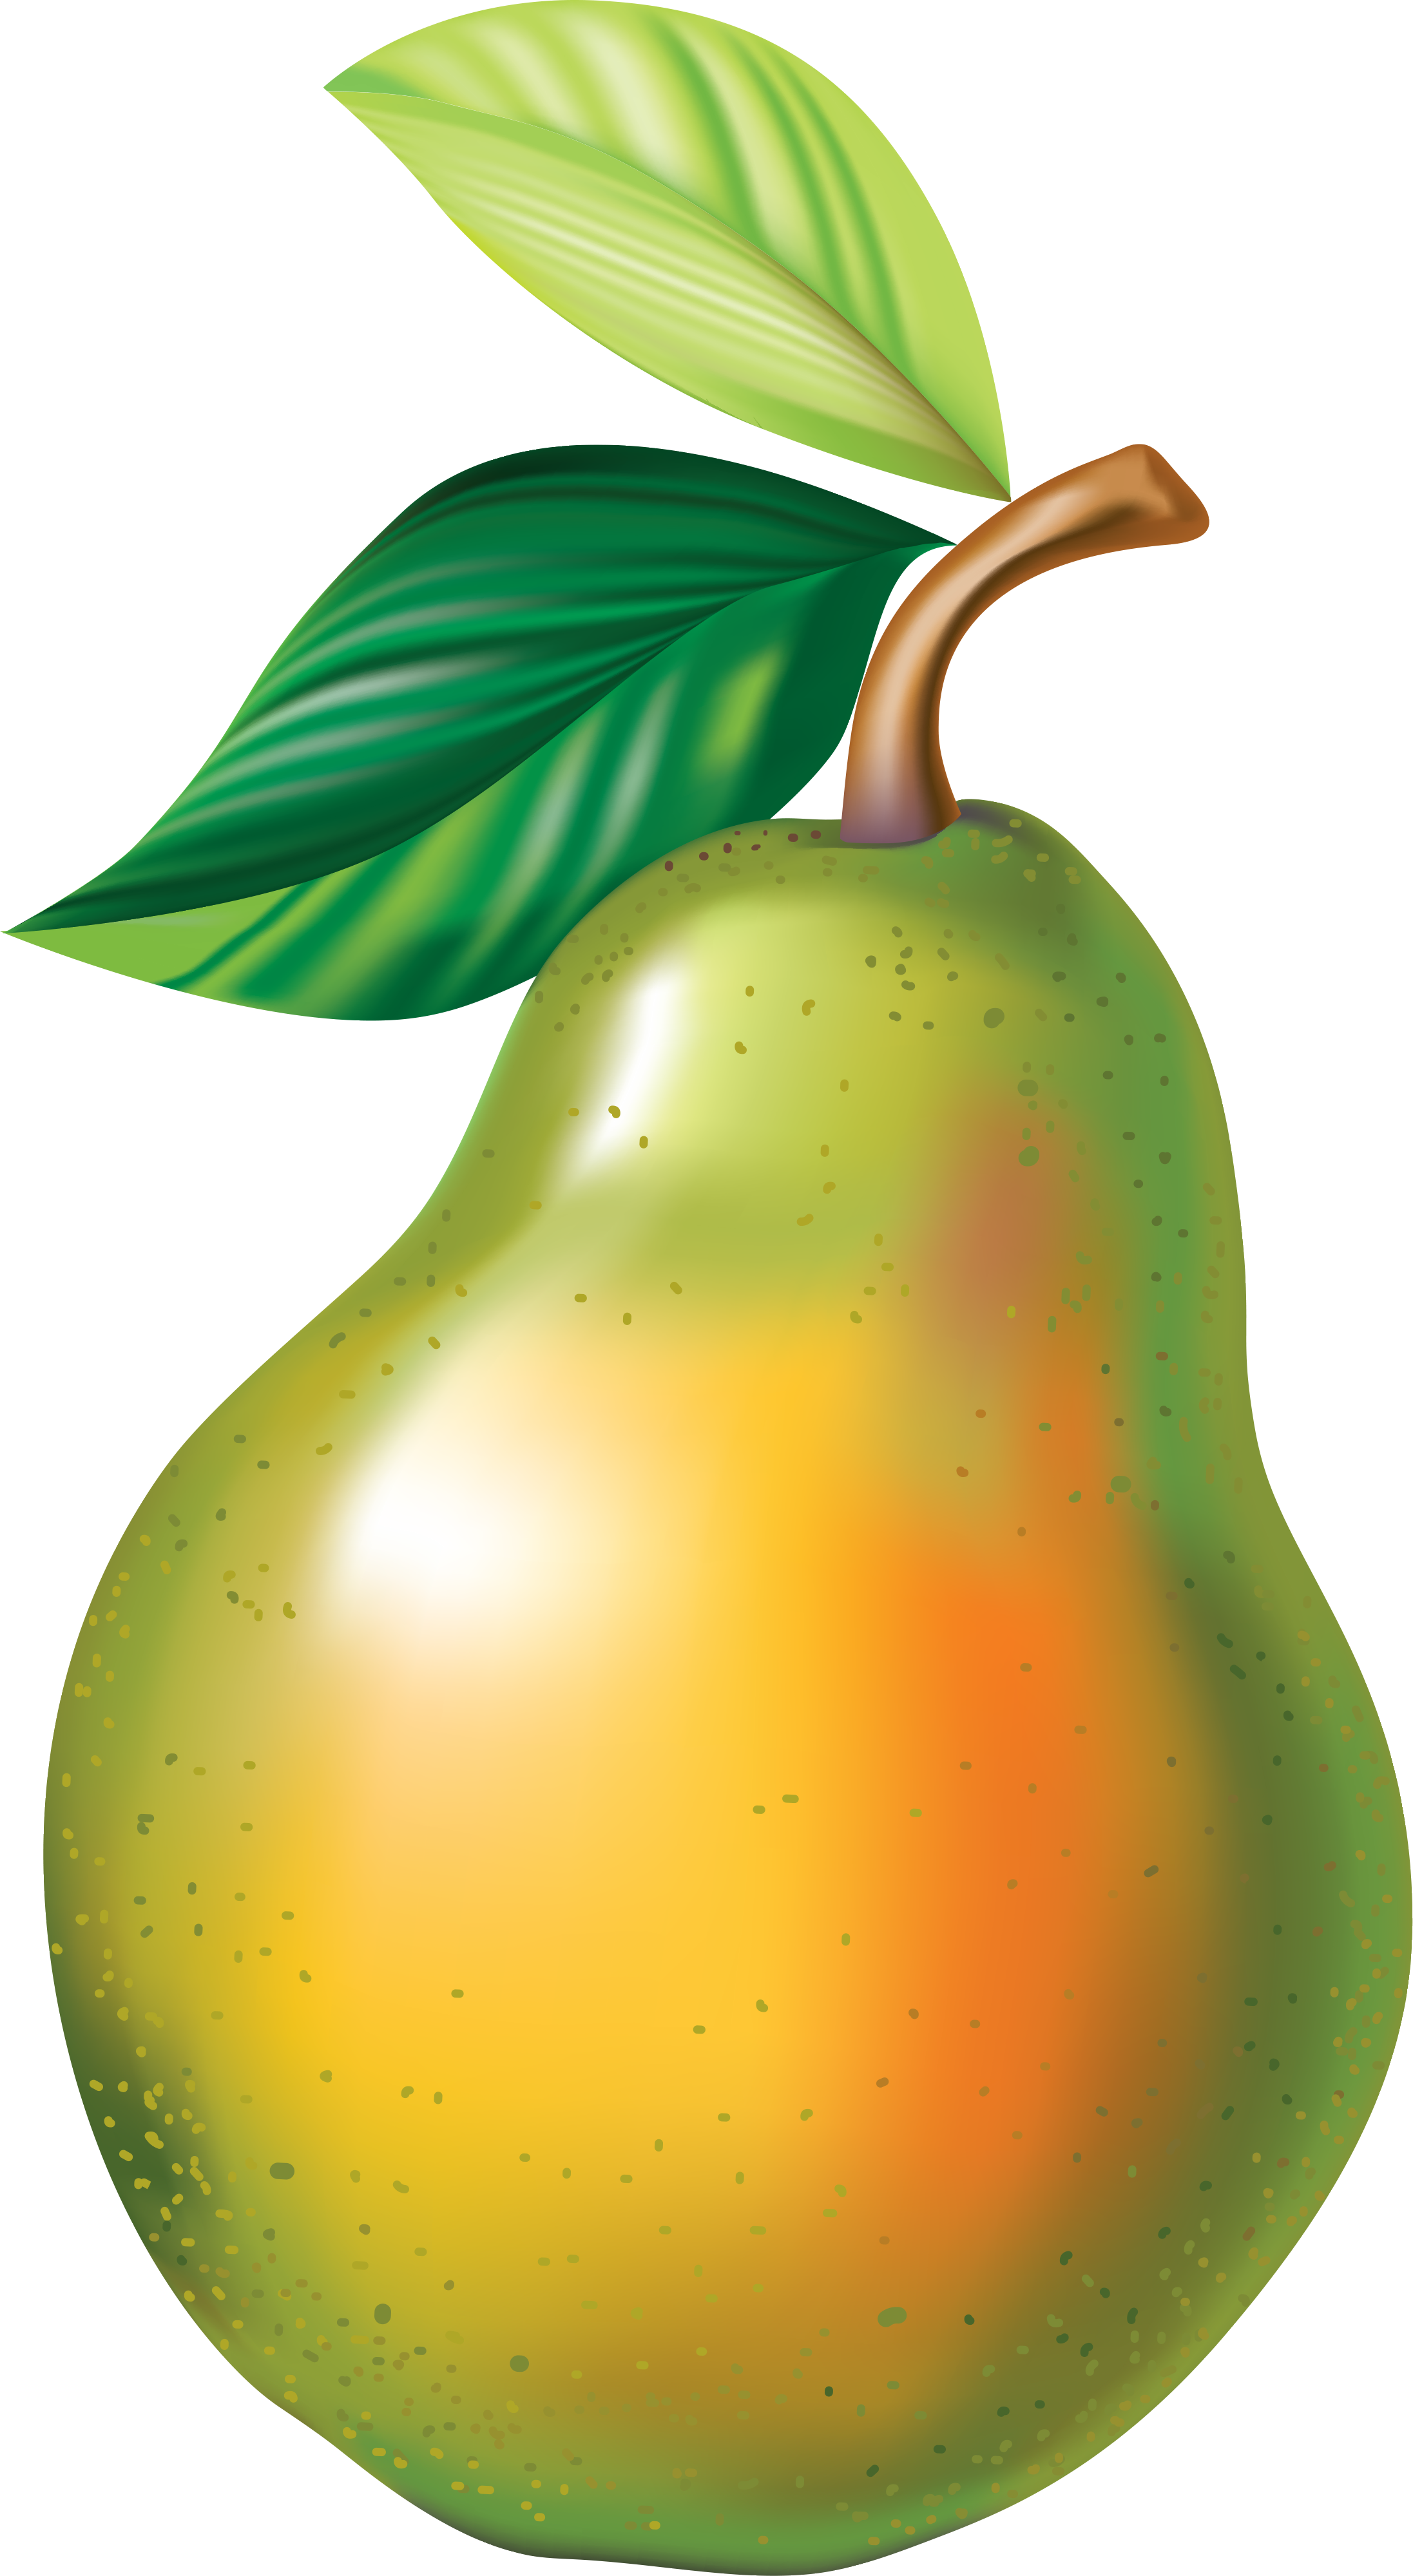 ec ef f. Fruit clipart house